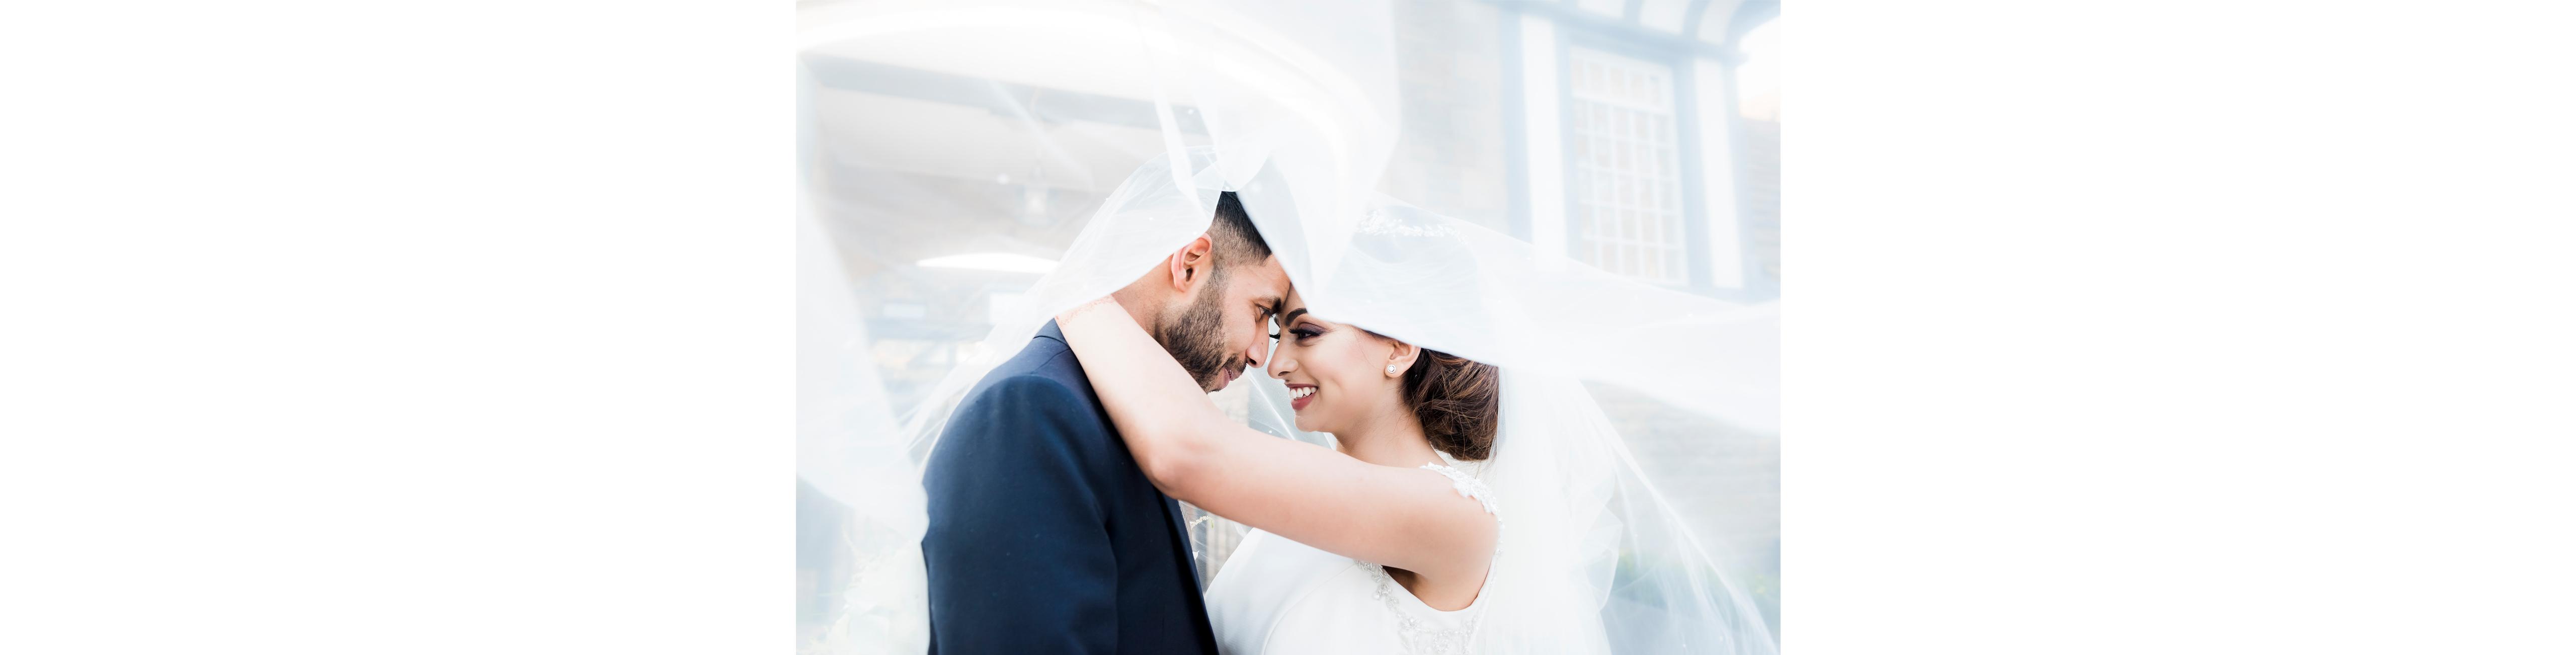 Bridal-veil-Groom-couple